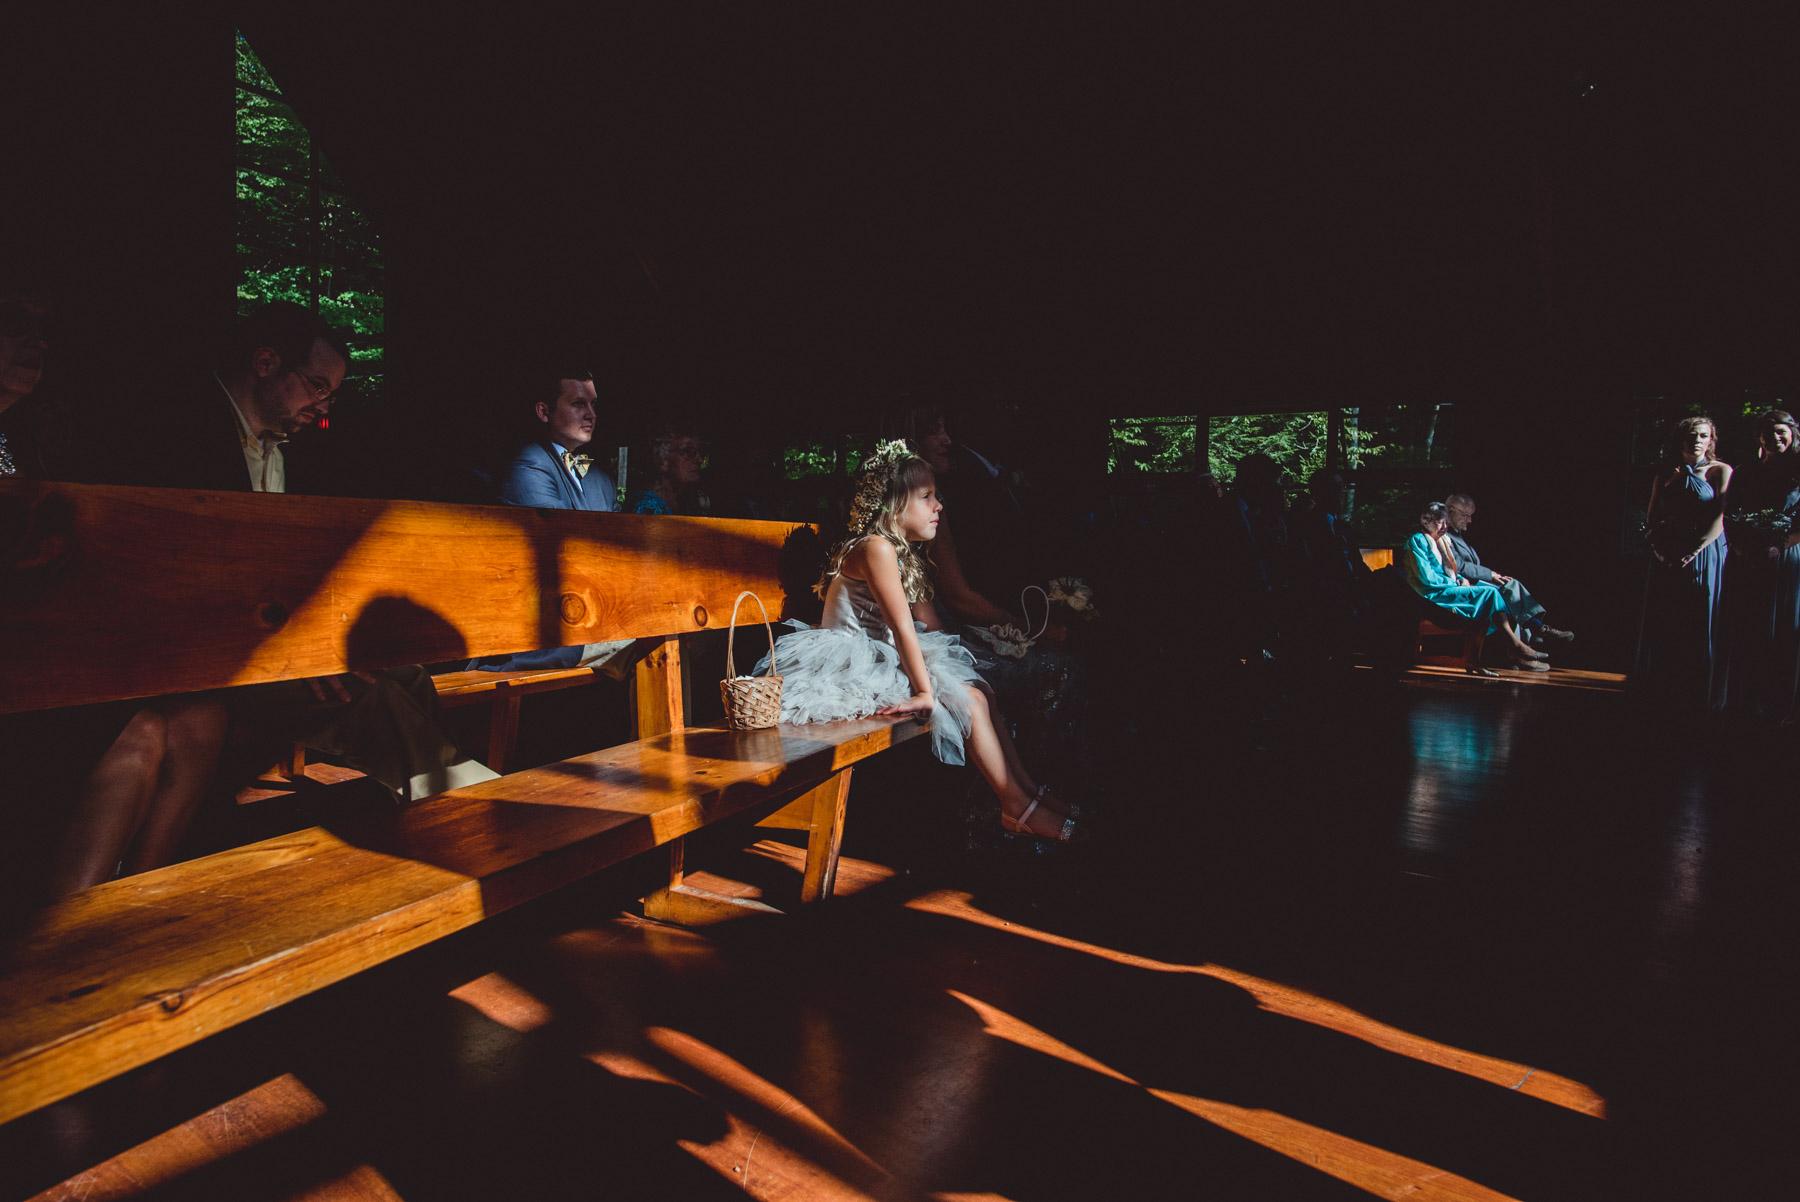 Wedding-Photography-Campground-10.jpg